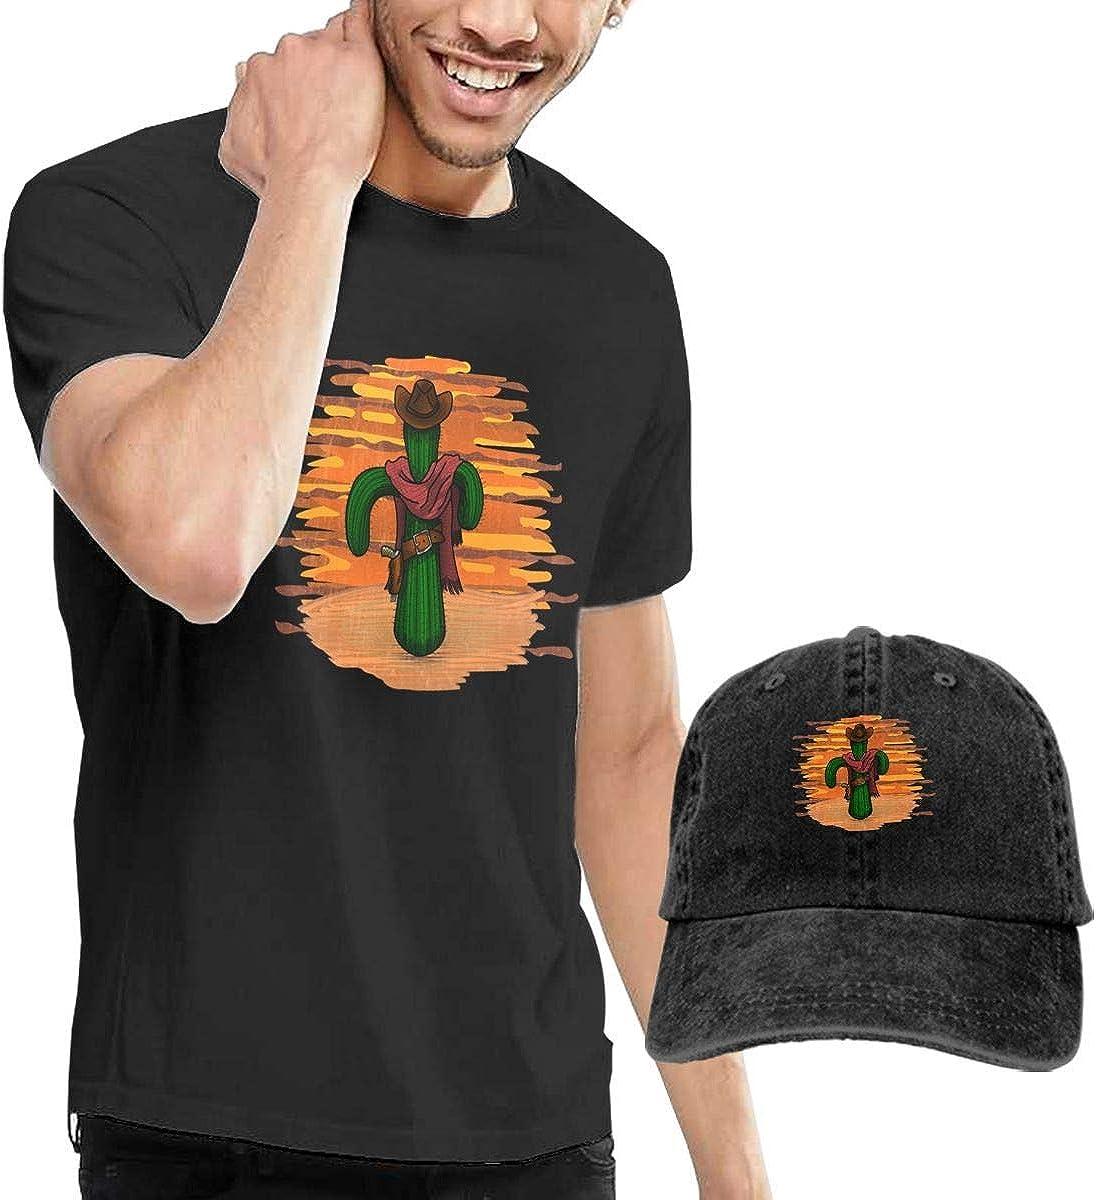 Henrnt Camiseta para Hombre,Tops y Camisas Sunset Cowboy ...